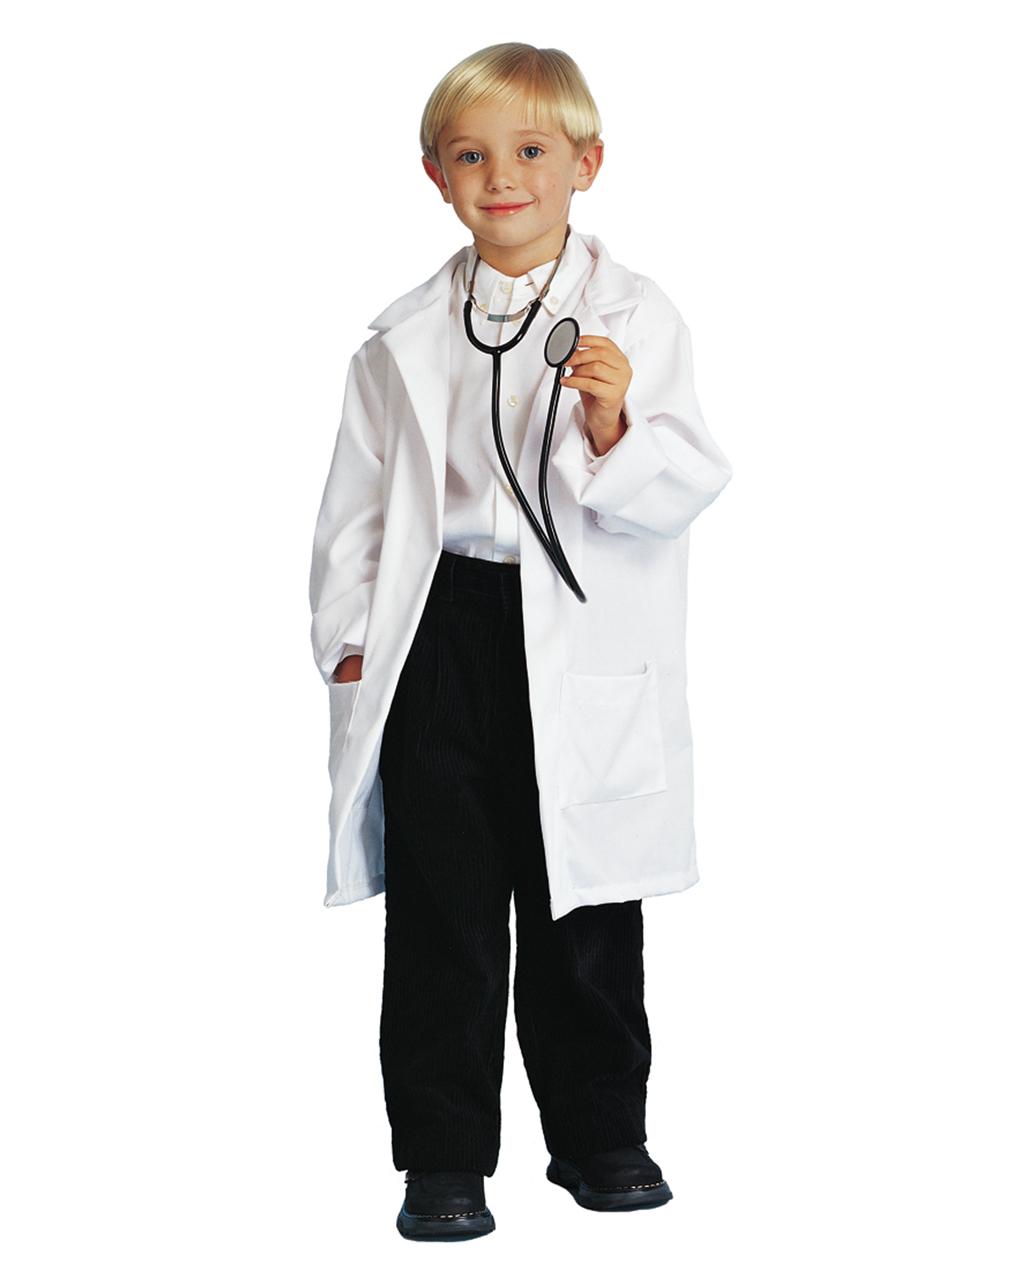 Kinder Professor Mantel Weiss Weisser Arztmantel Fur Kinder Horror